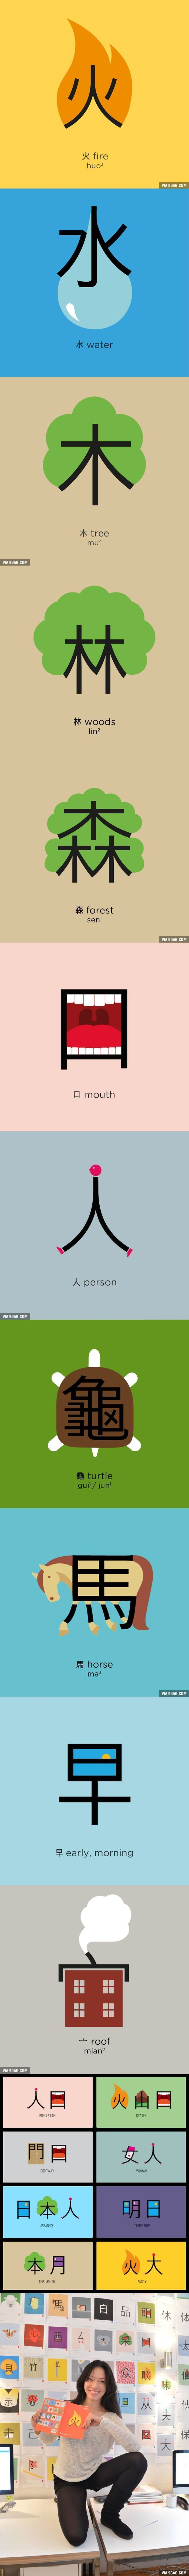 kanji #easyjapaneselanguage #signlanguageposter